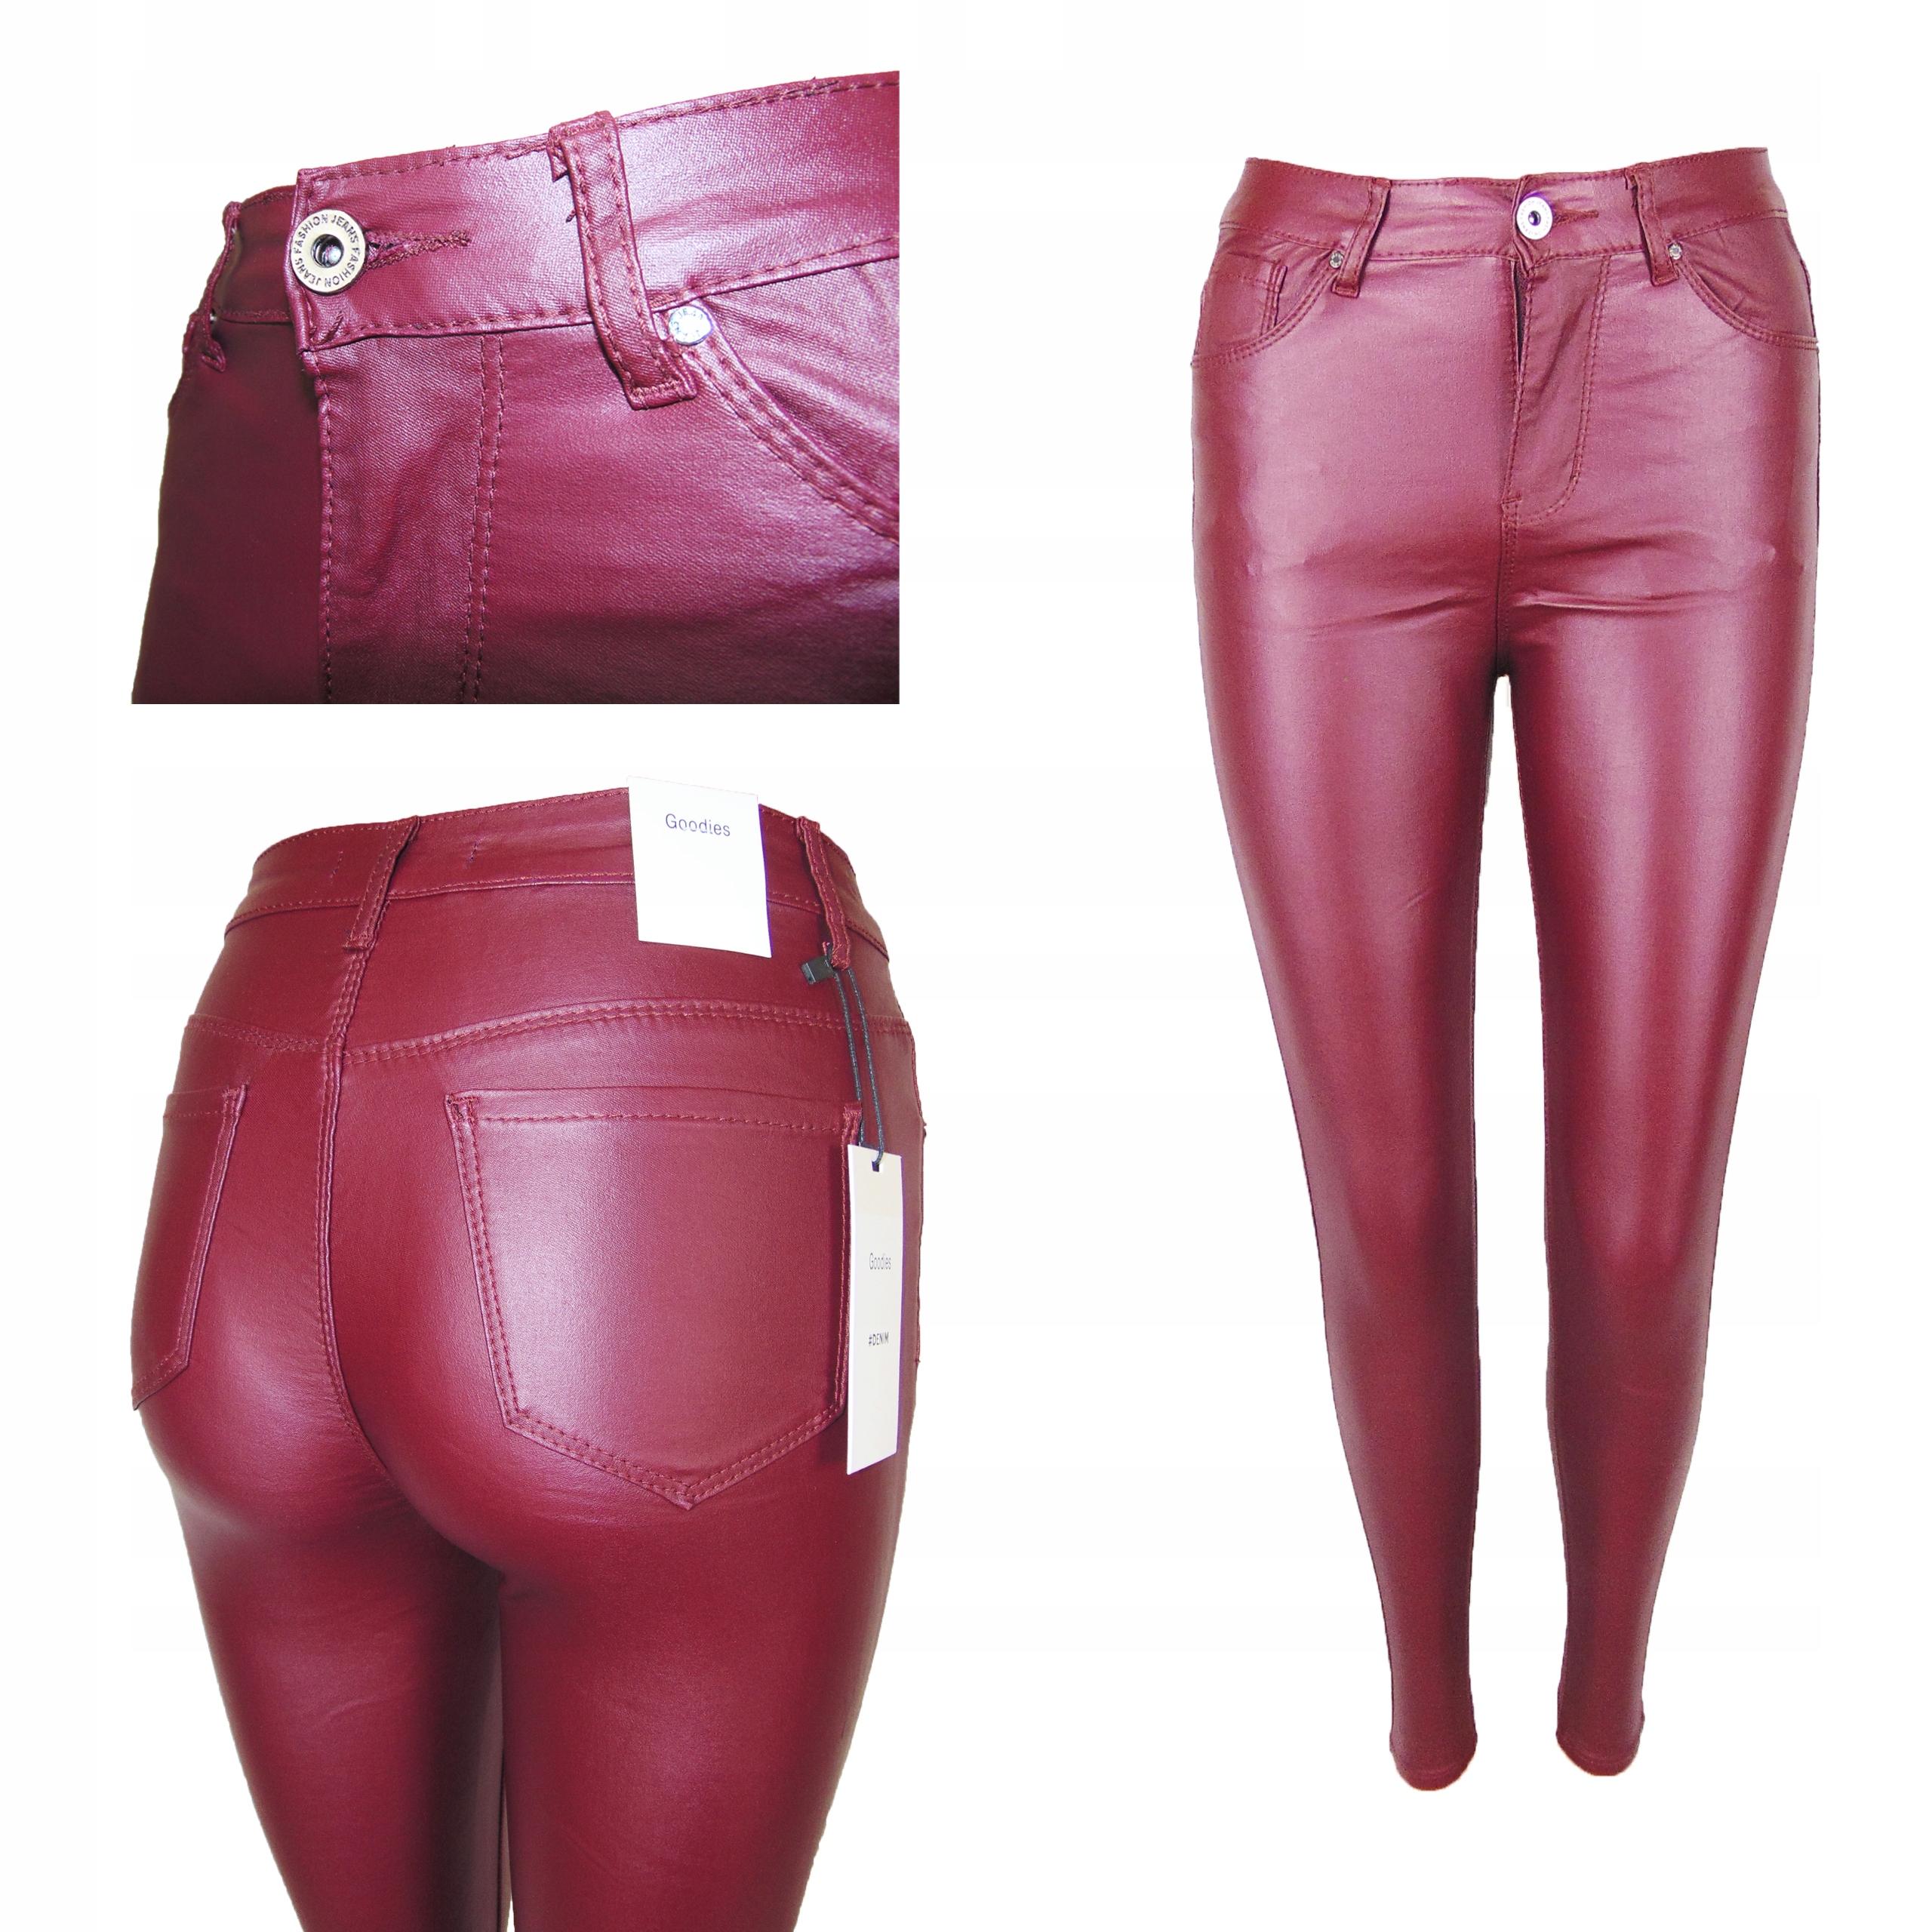 Spodnie Woskowane Goodies Bordo Push R46